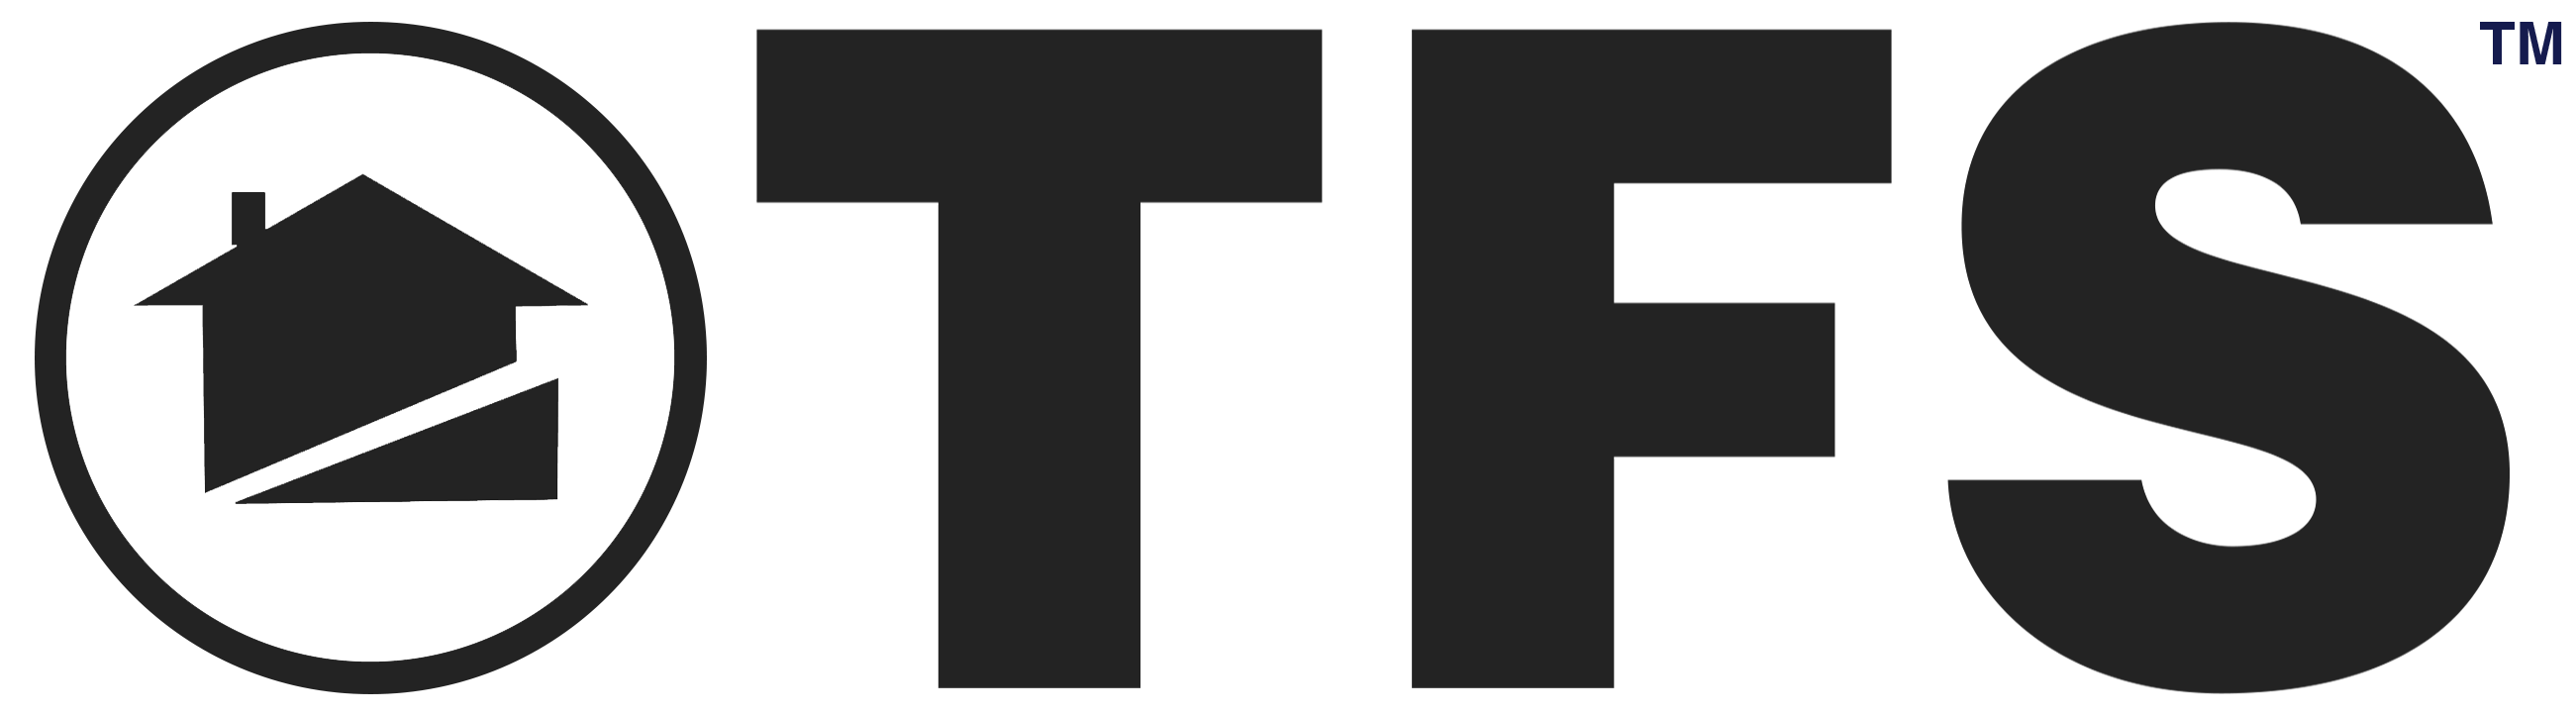 The Foundation Specialists company logo